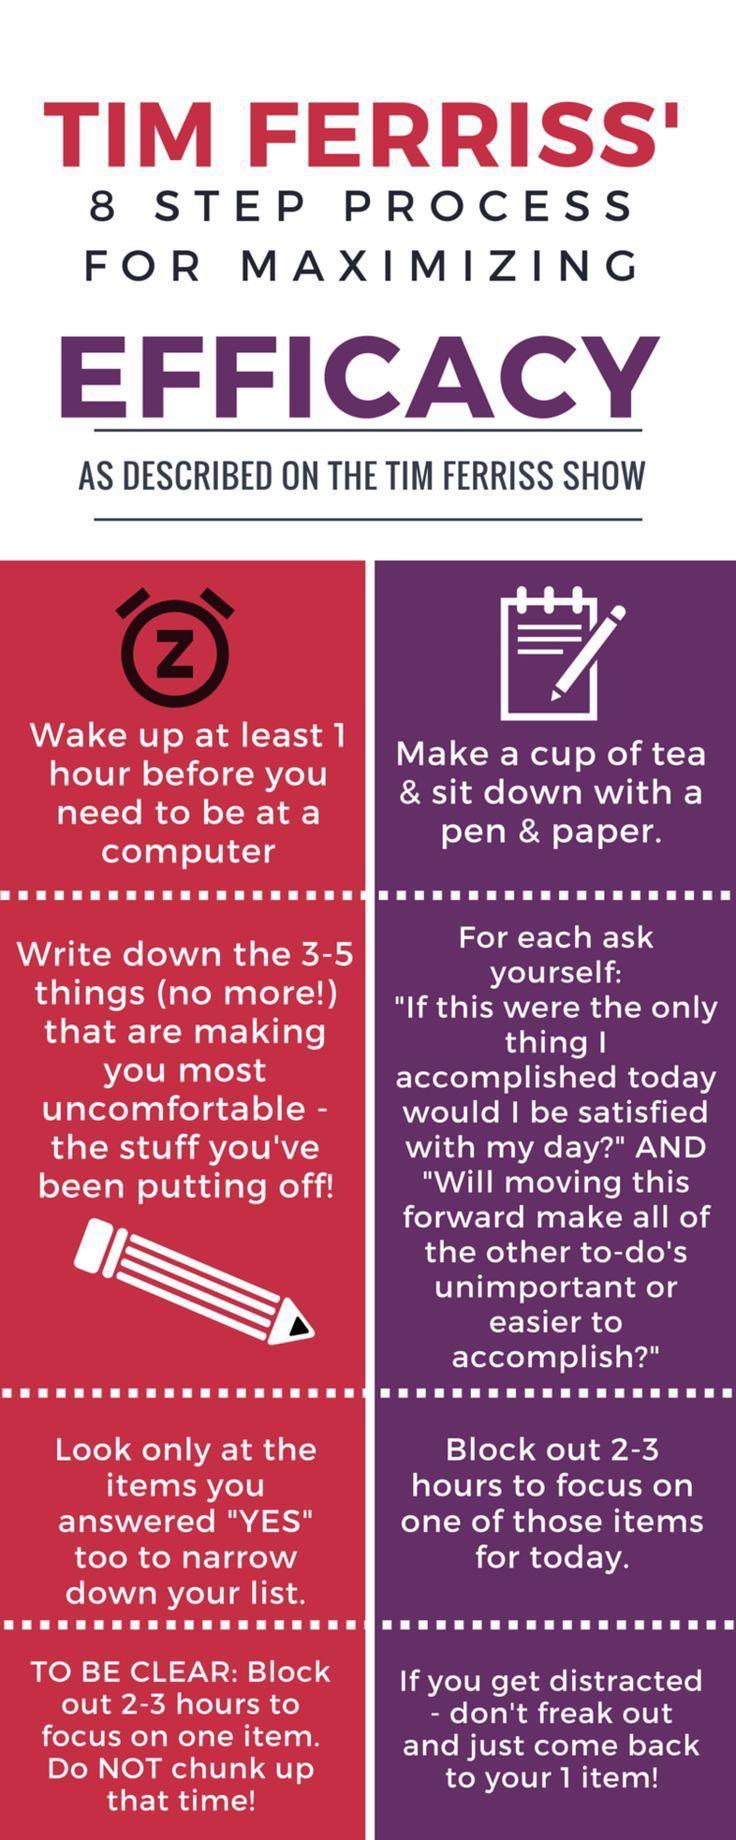 Tim Ferriss' 8 Steps for Maximizing Efficacy — The Fit Nerd...I got so muc...